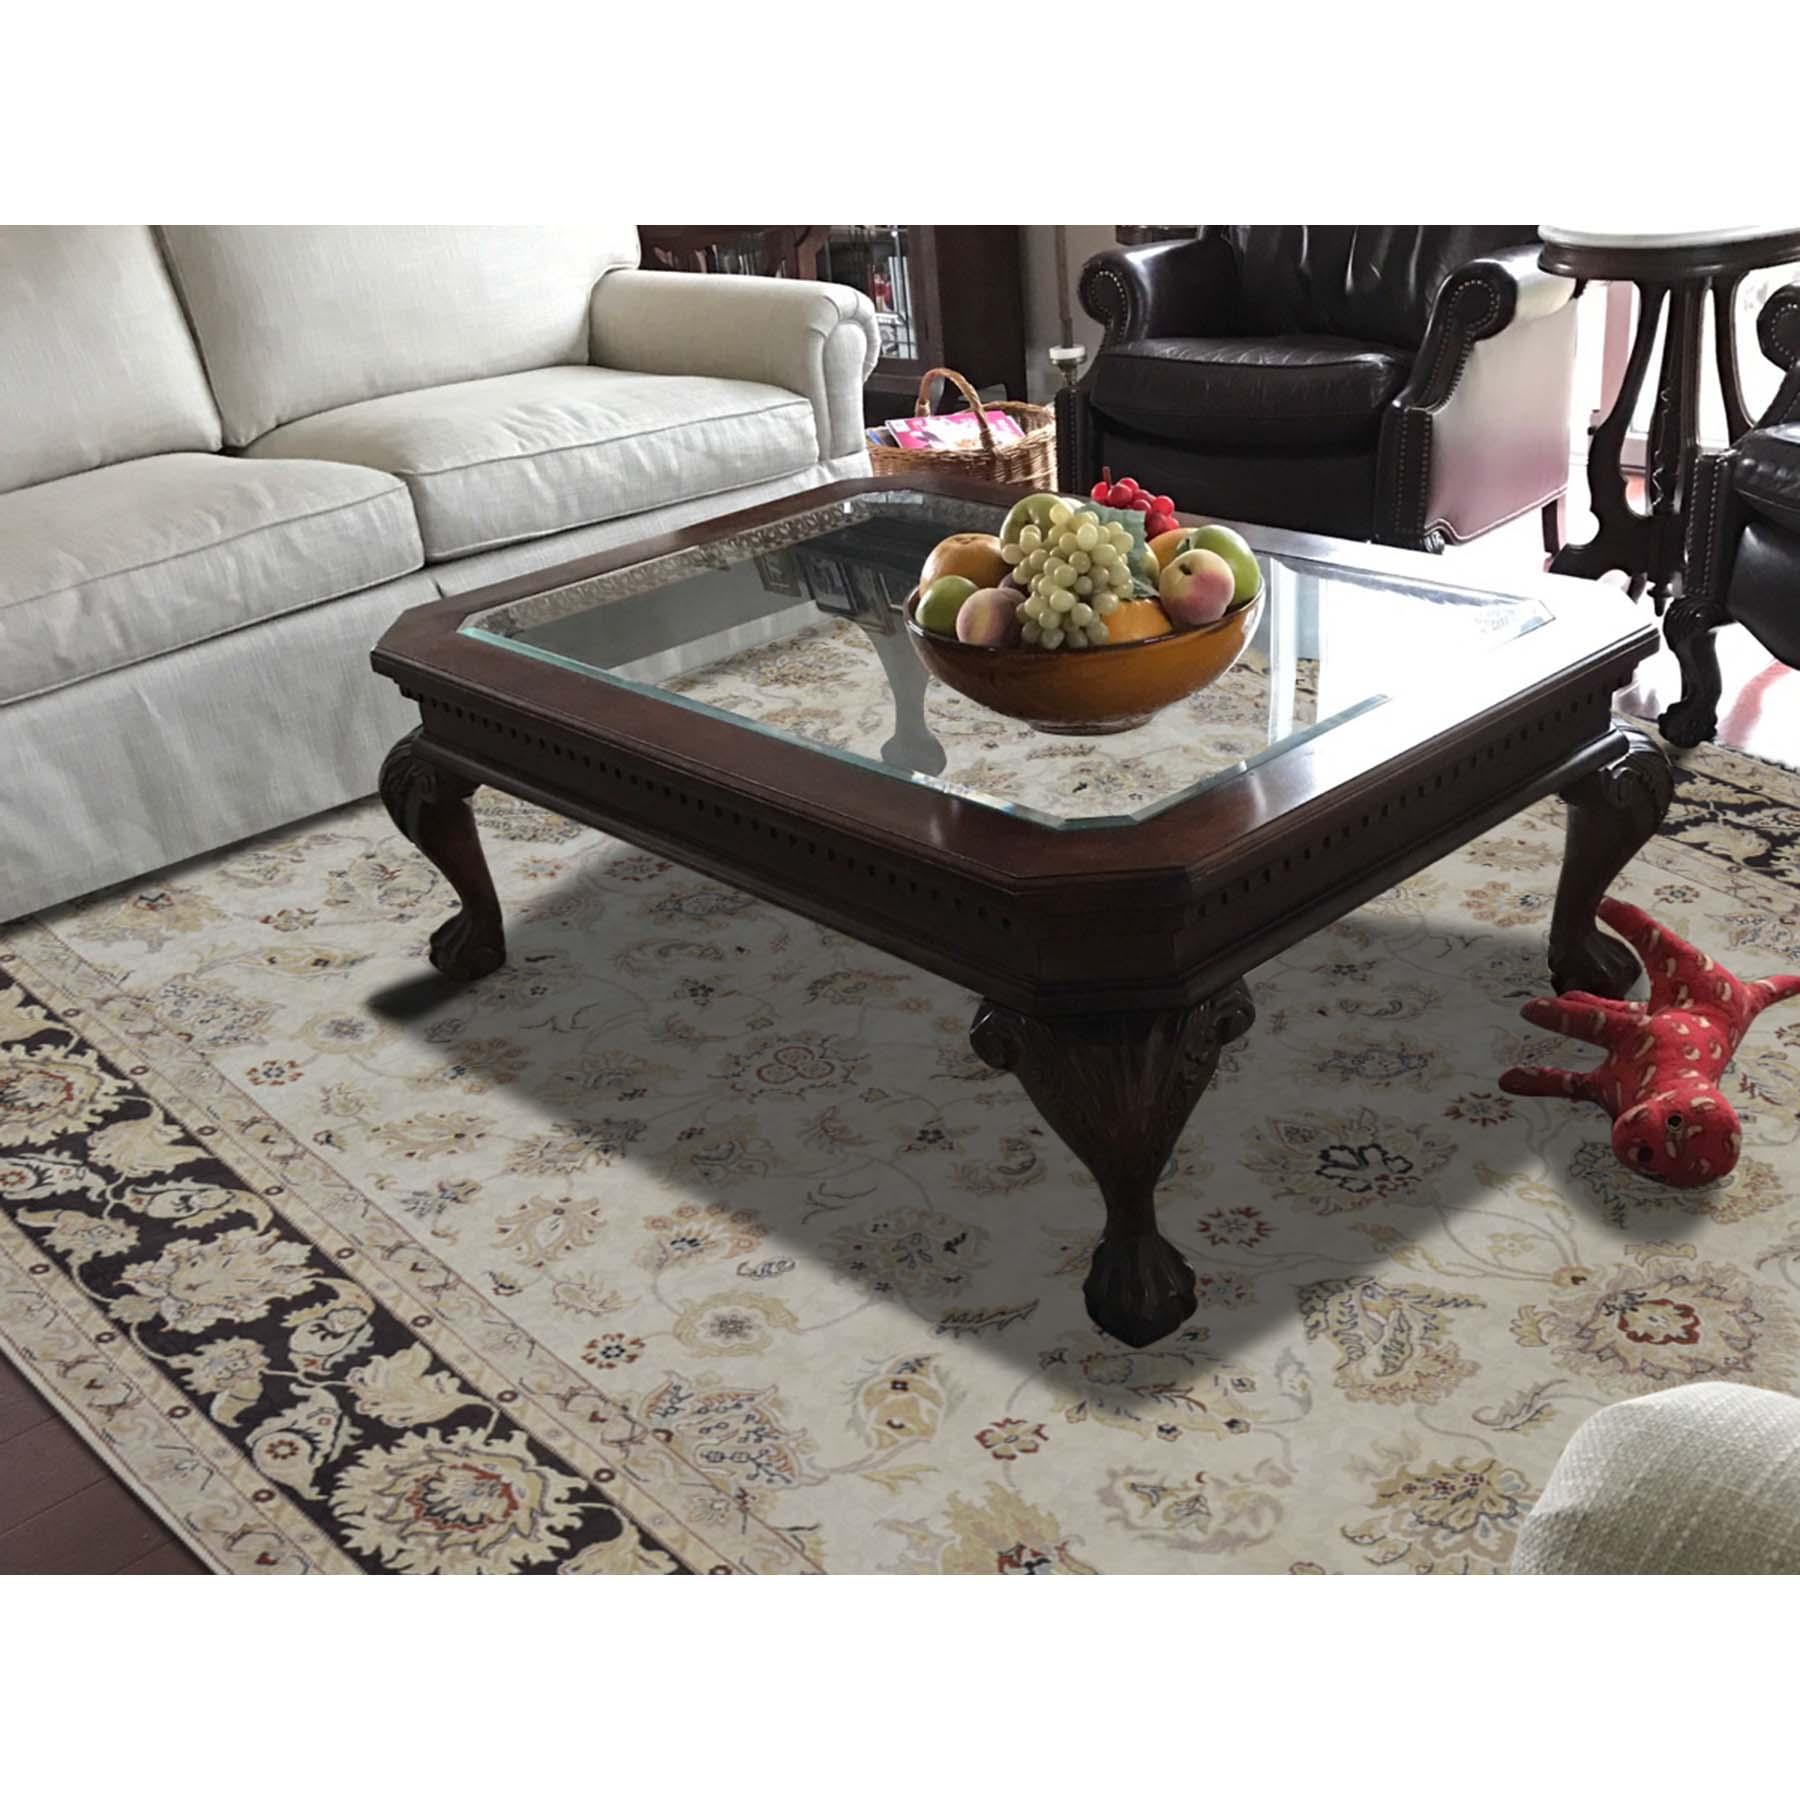 Shahbanu Oriental Carpets And Persian Rugs In The Usa -> Aki Carpetes